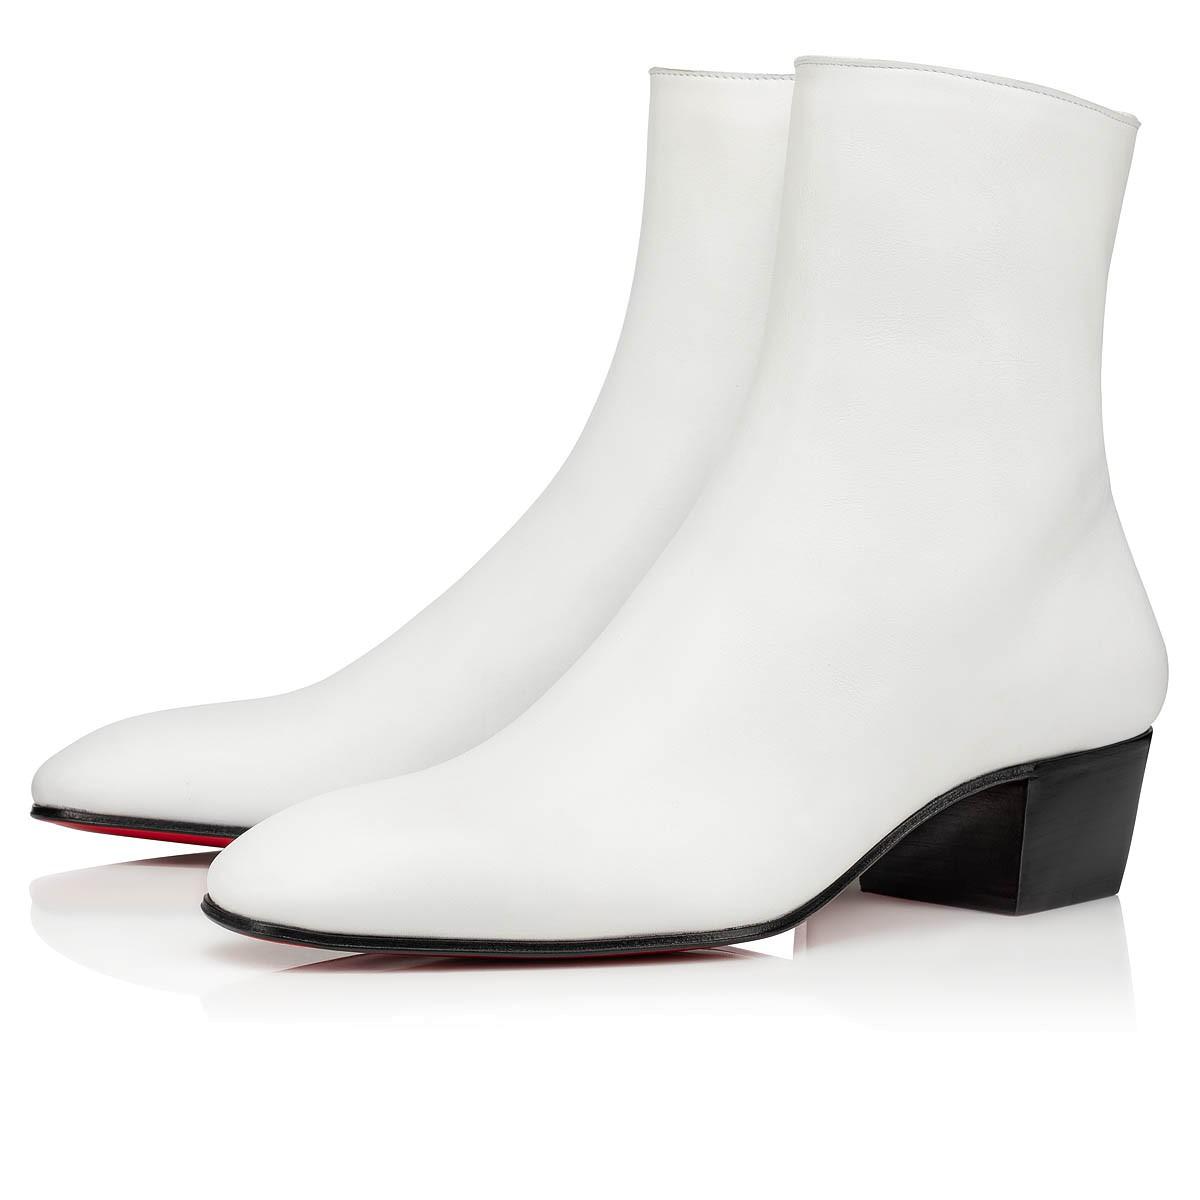 Shoes - Jolly - Christian Louboutin